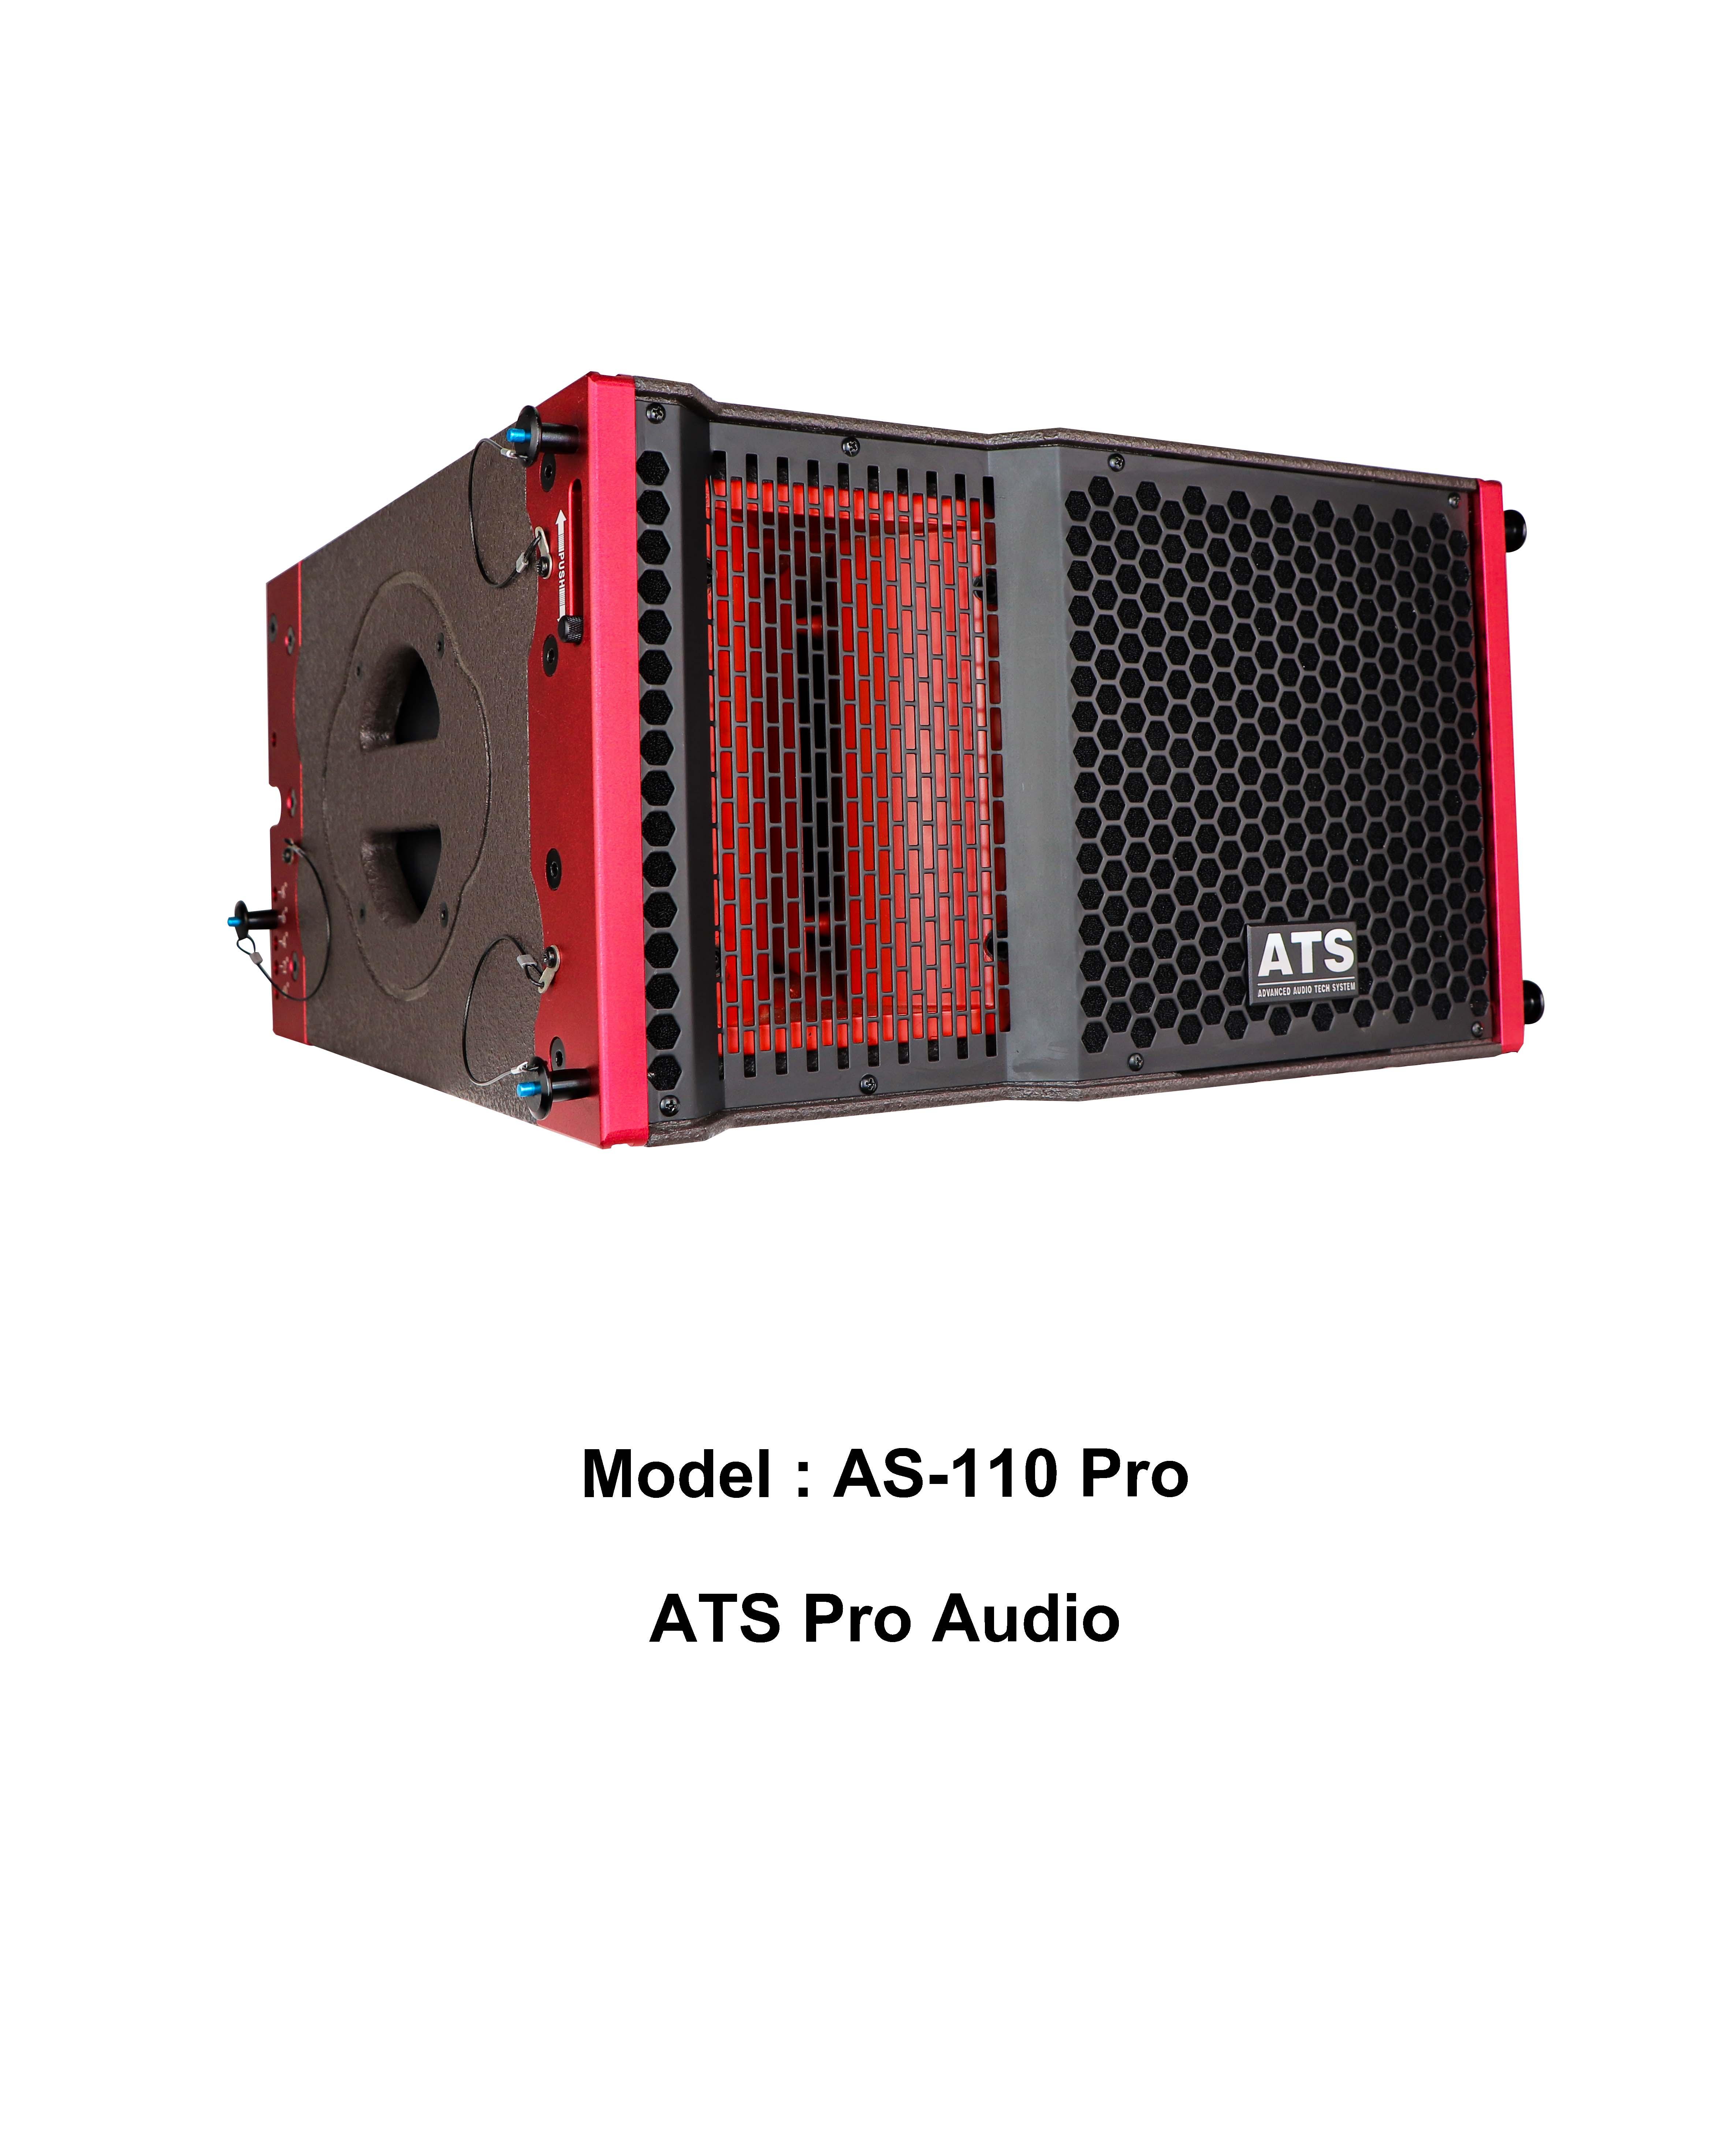 AS-110 Pro